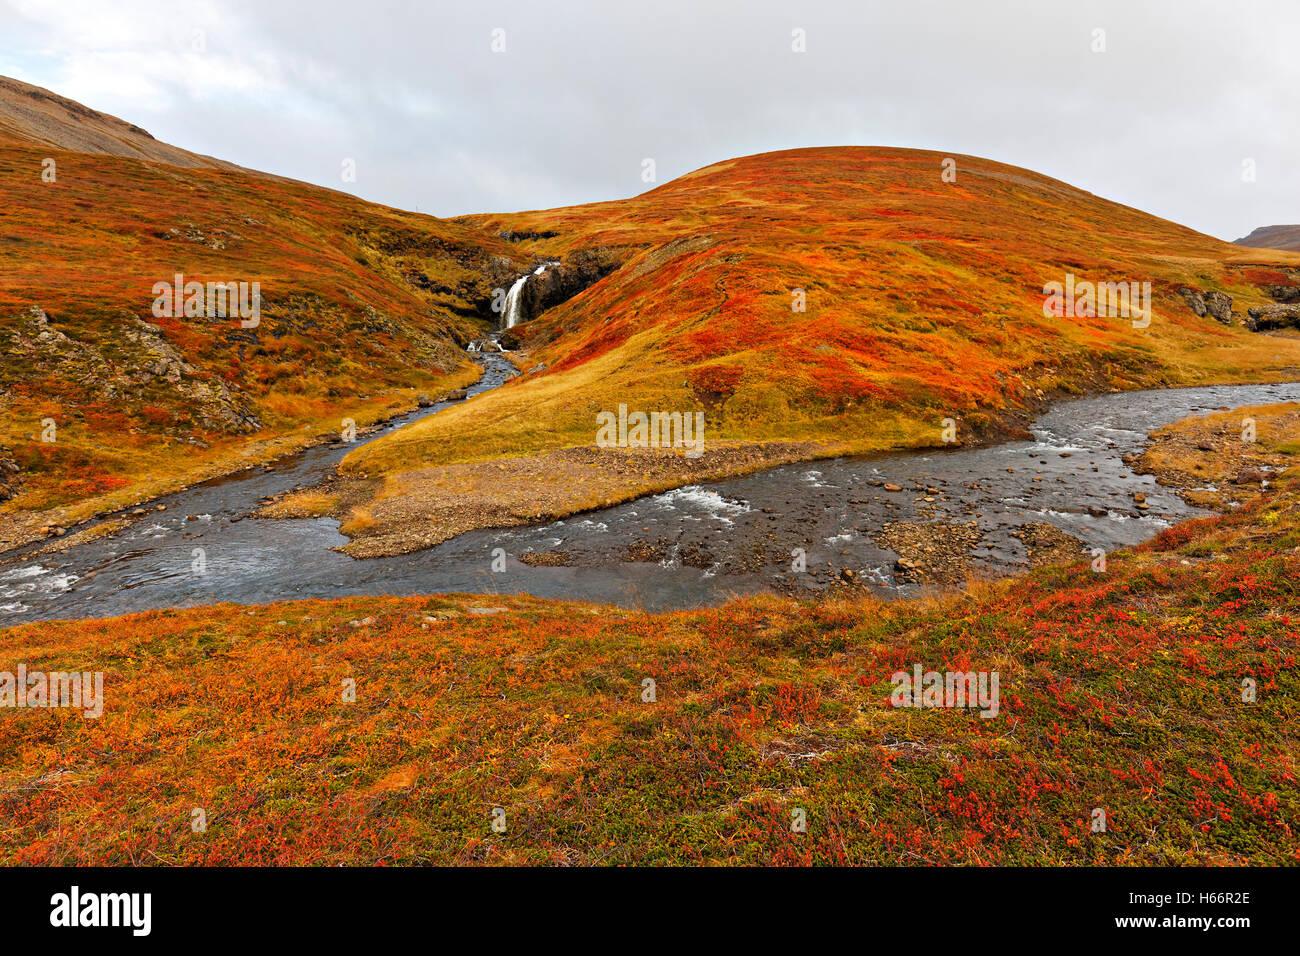 Kleiner Wasserfall in goldene Herbstlandschaft, Westisland, Nordatlantik, Europa Stockbild